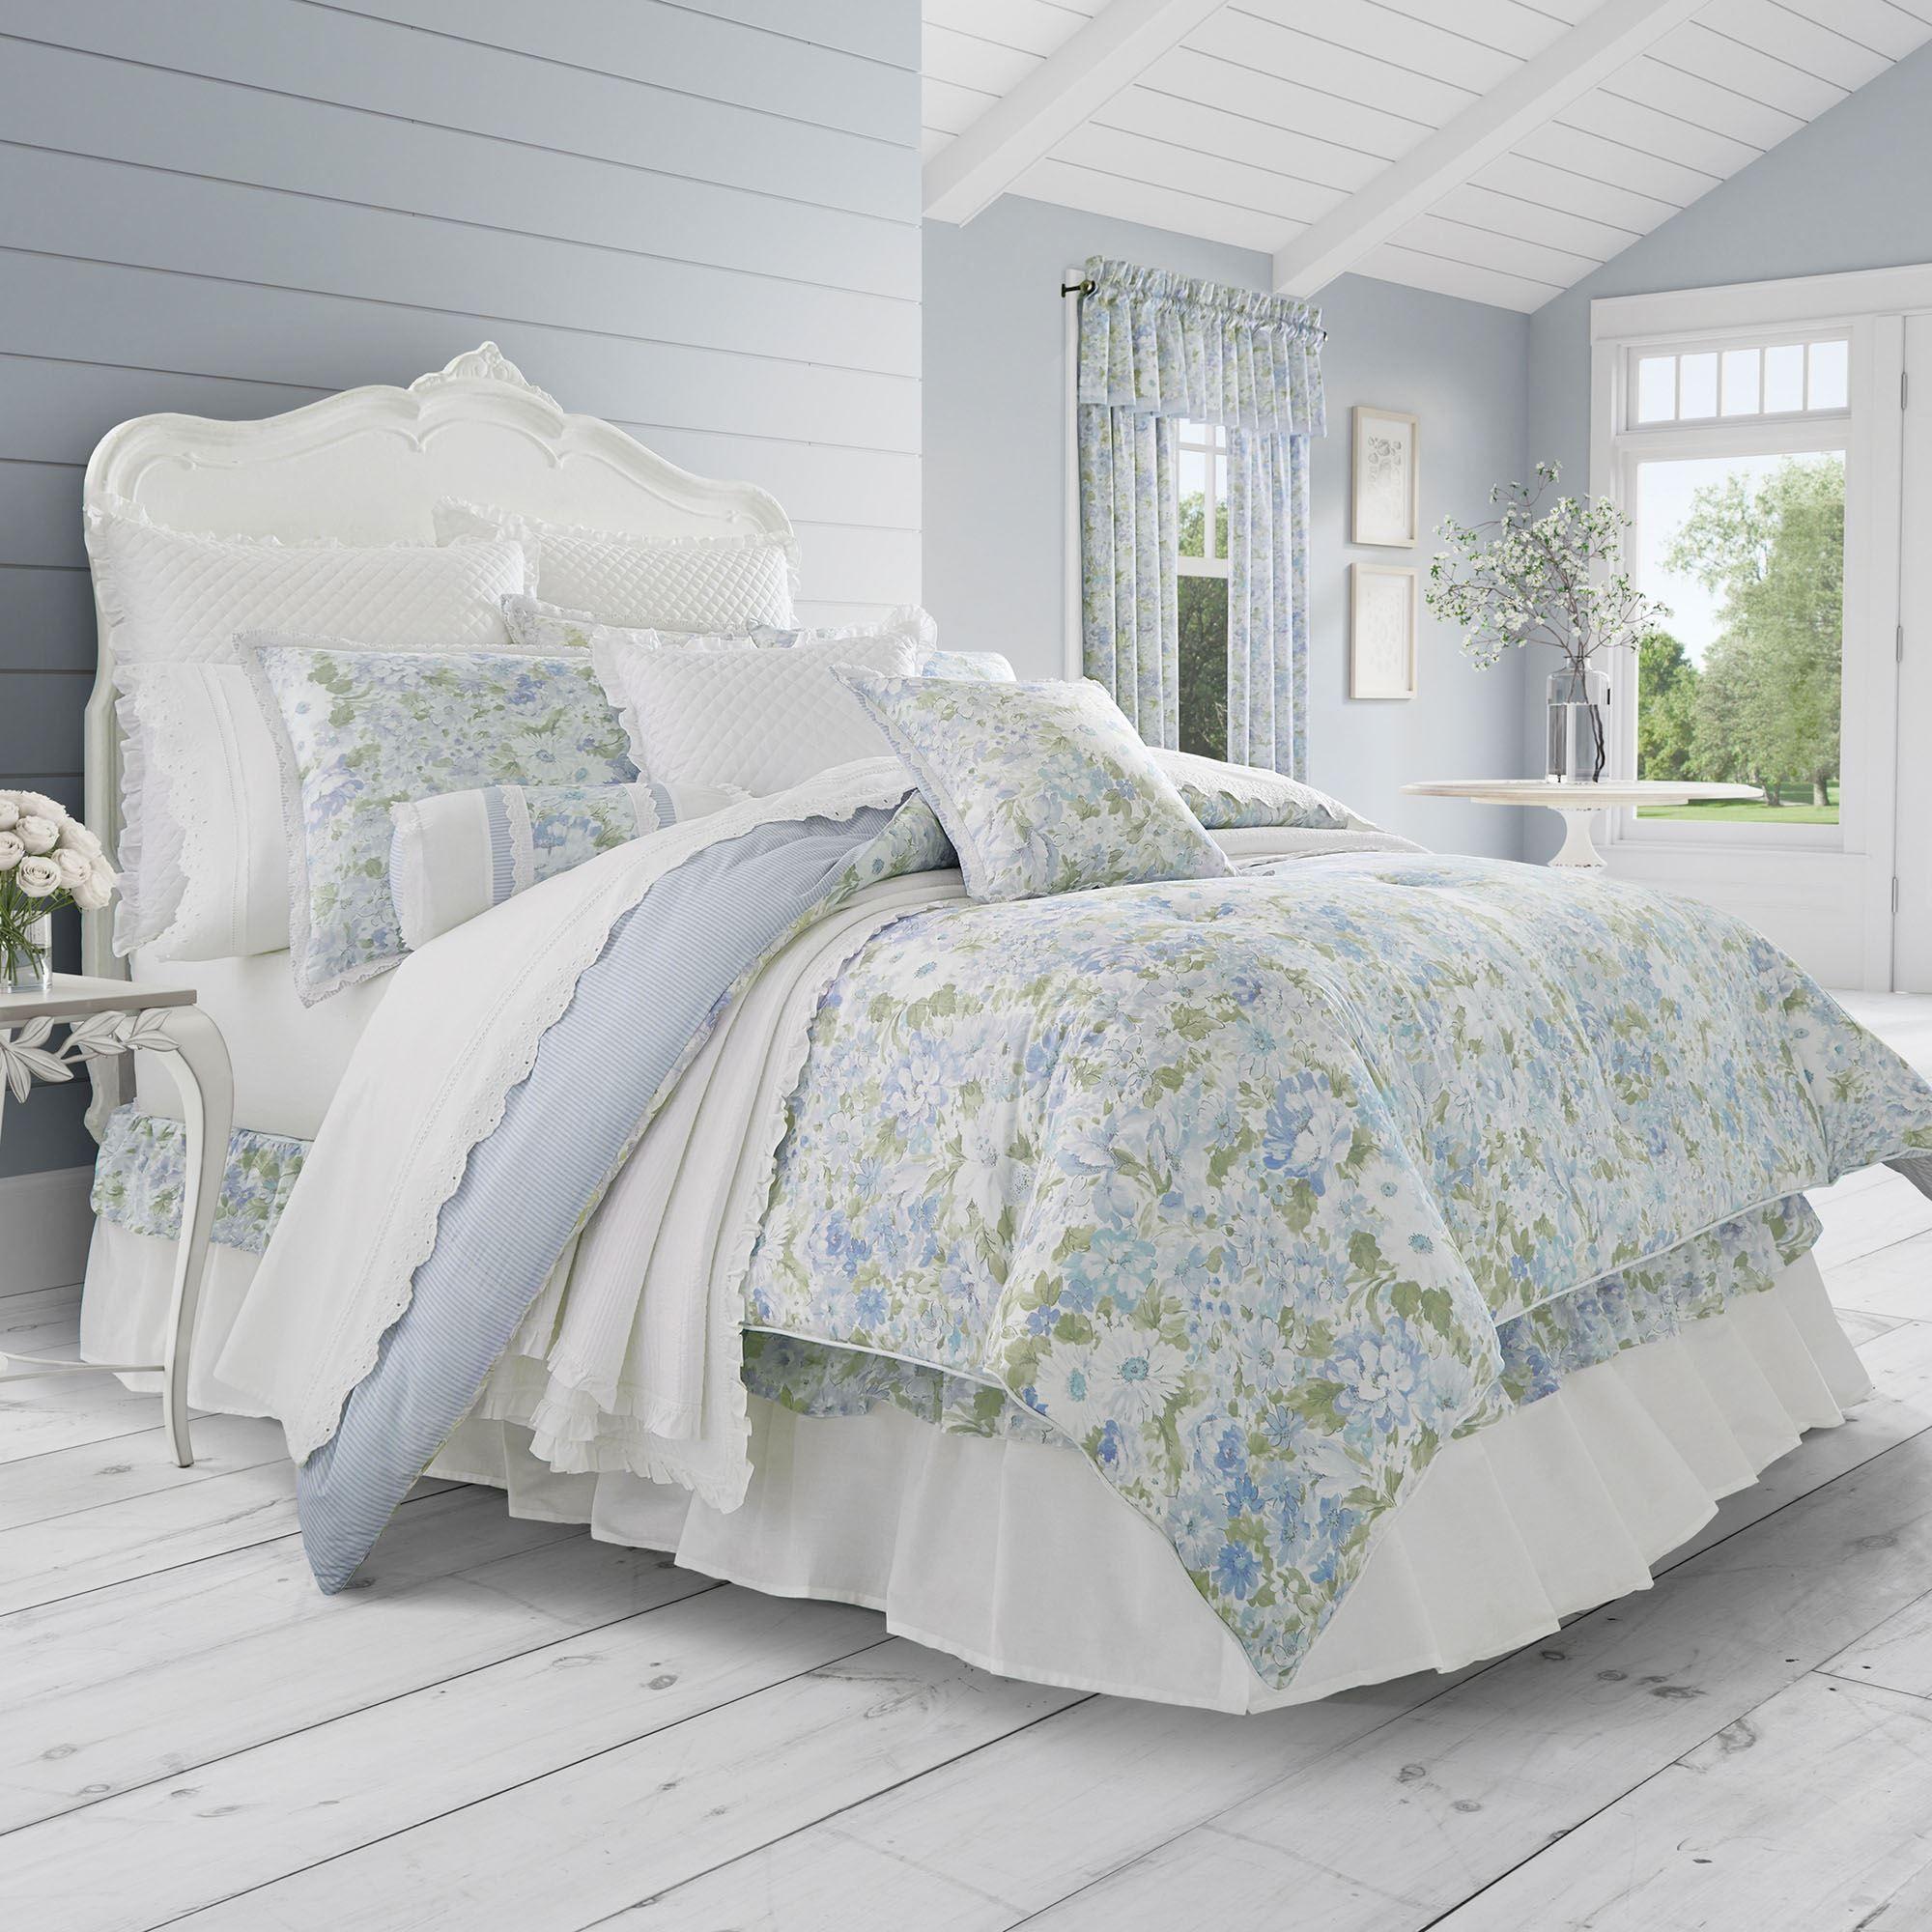 Merveilleux Flowerbed Comforter Set Wedgewood Blue